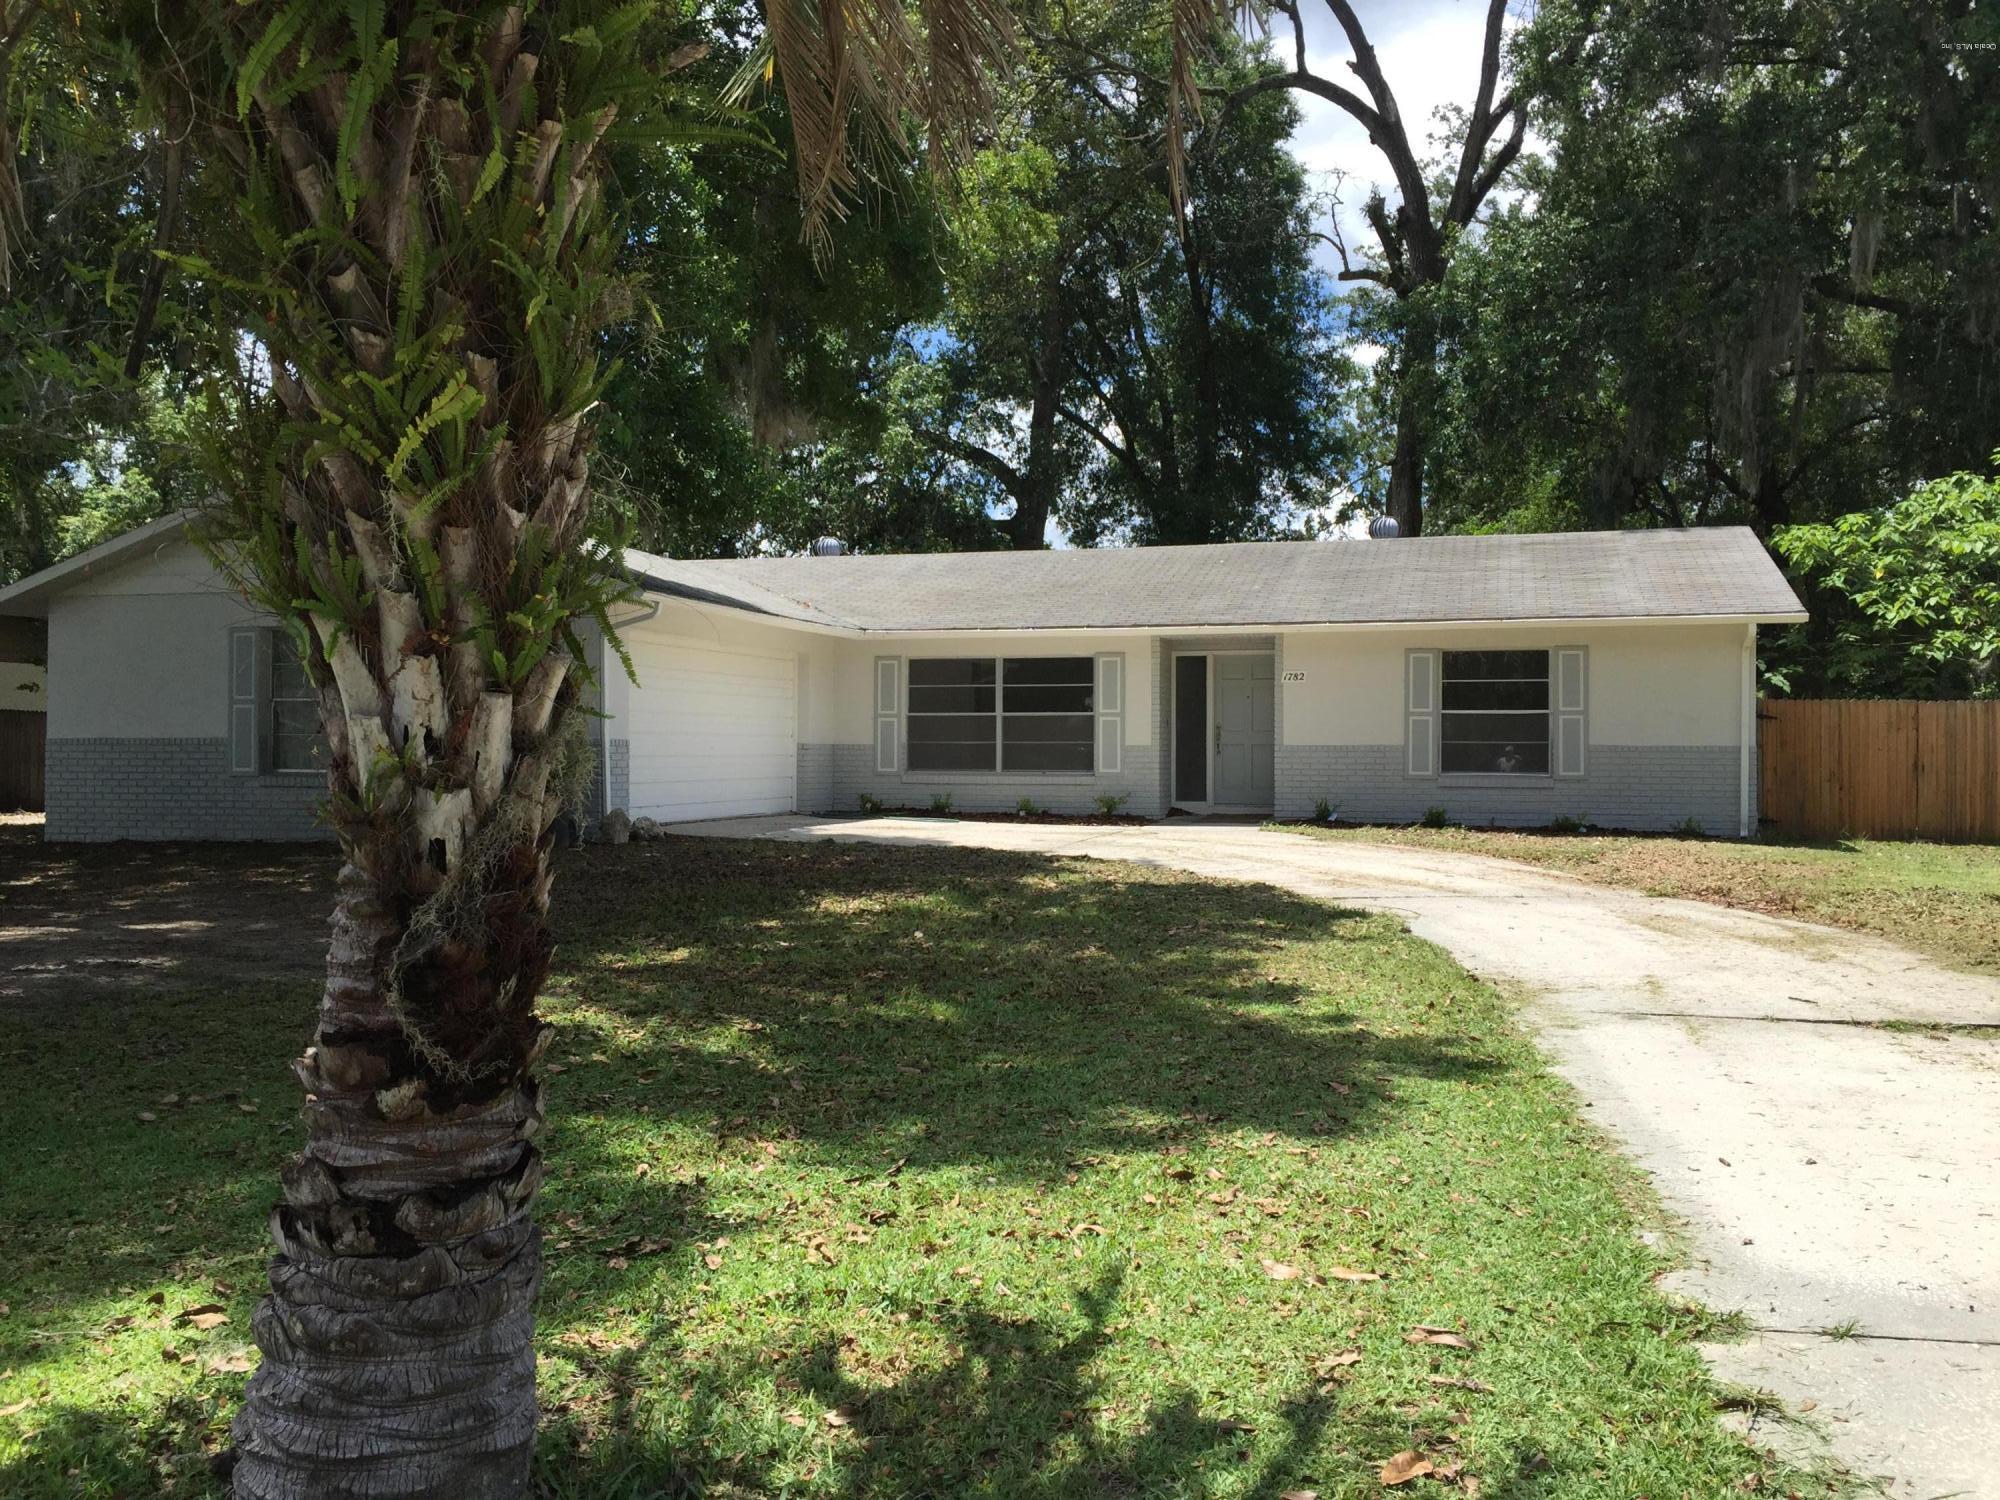 1782 NE 17TH STREET, OCALA, FL 34470